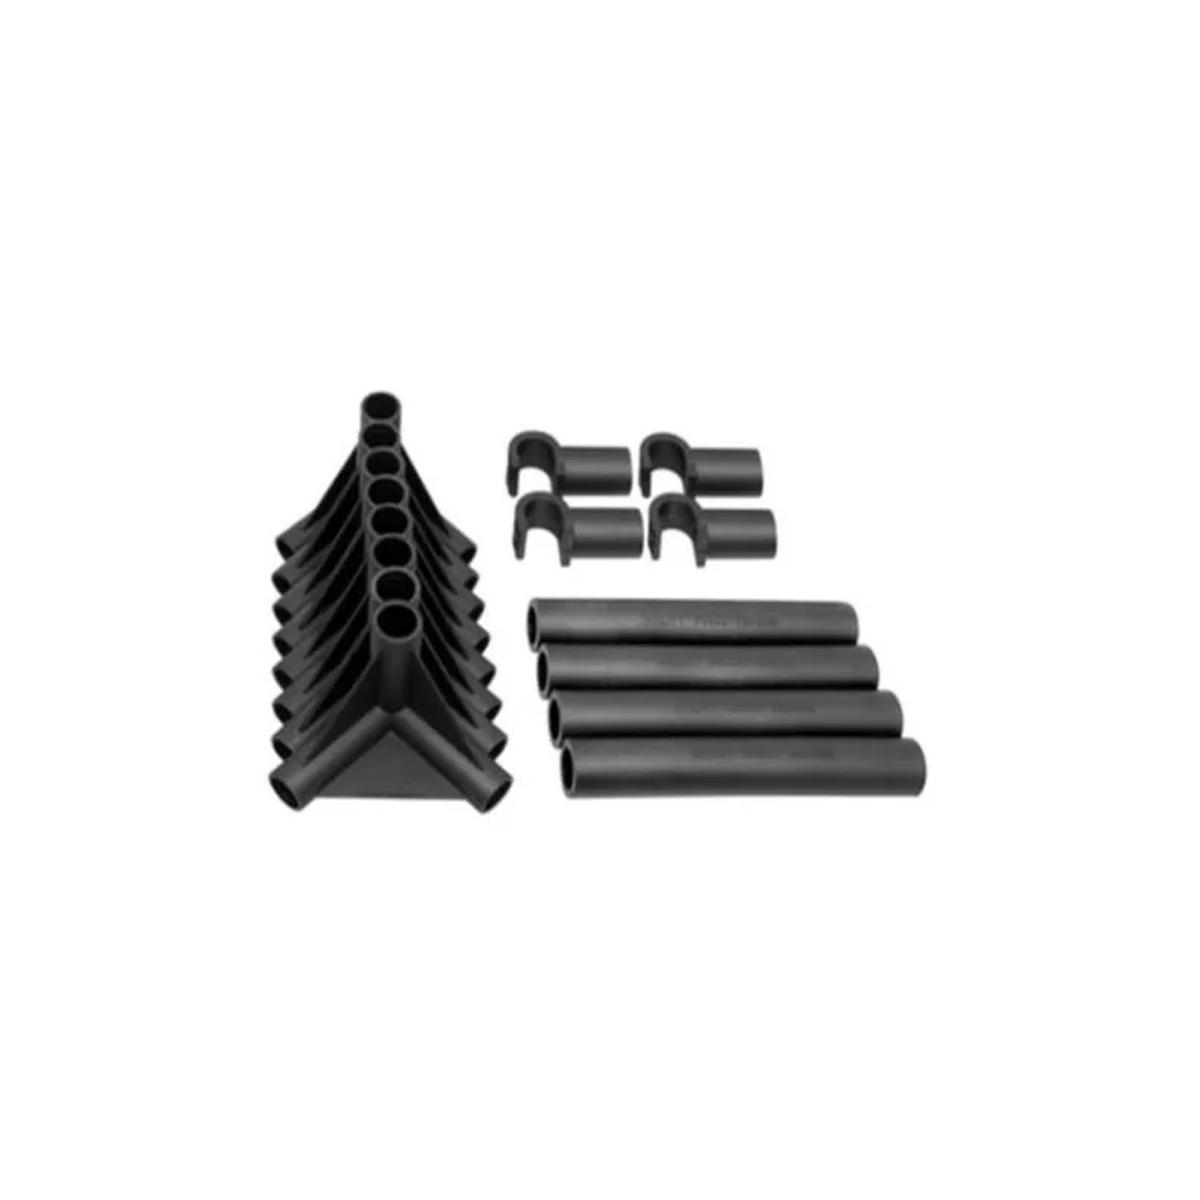 Estufa Pro Box Basic Pro 60 - 60x60x160 cm